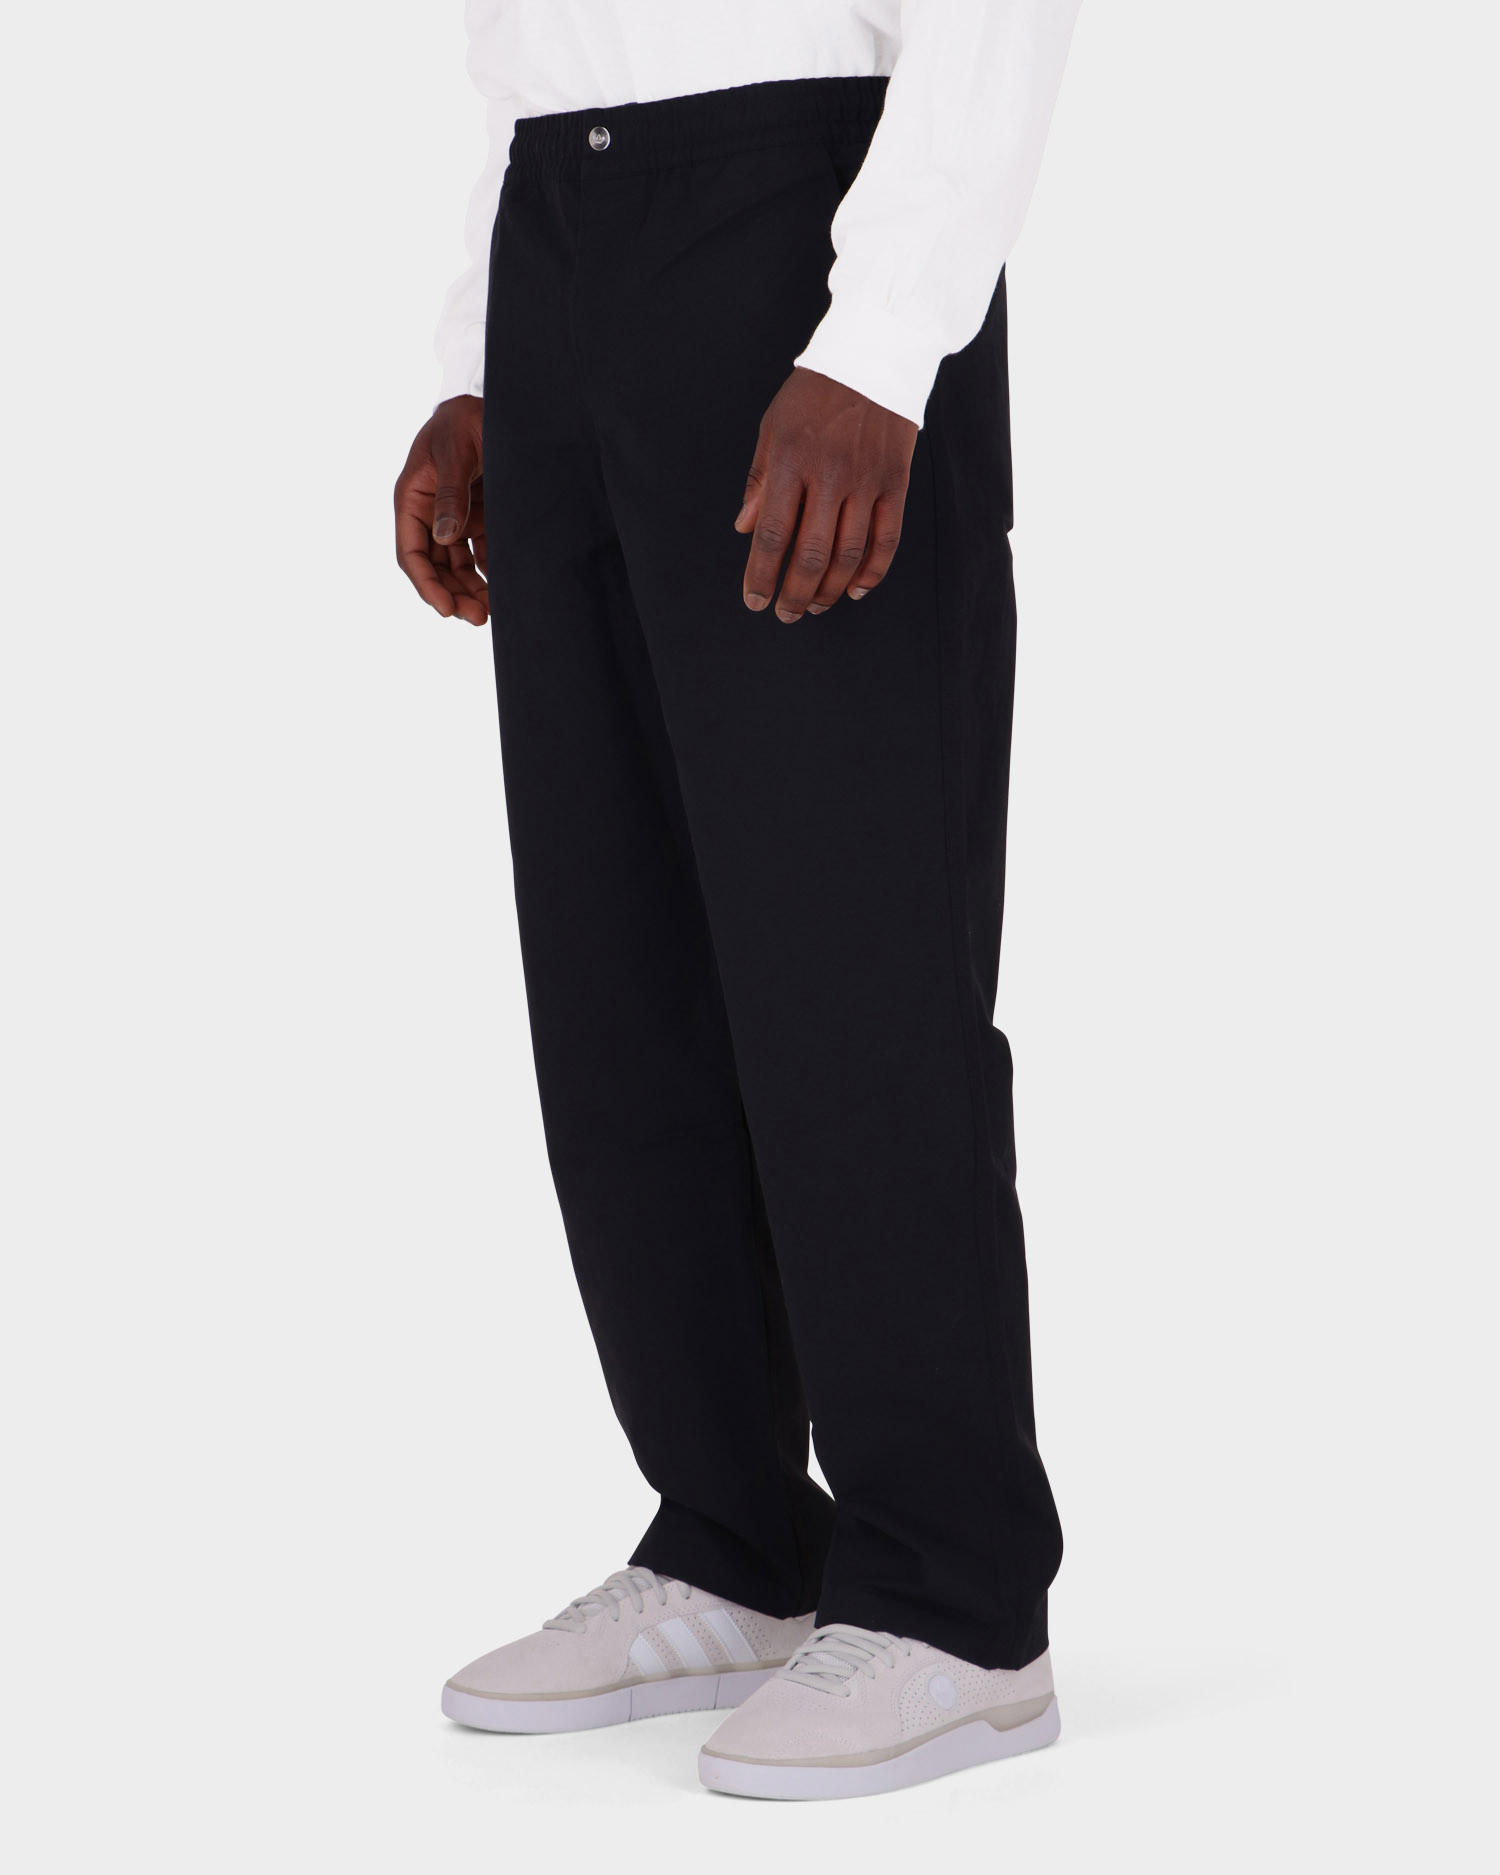 Adidas skateboarding Loose Pant Black